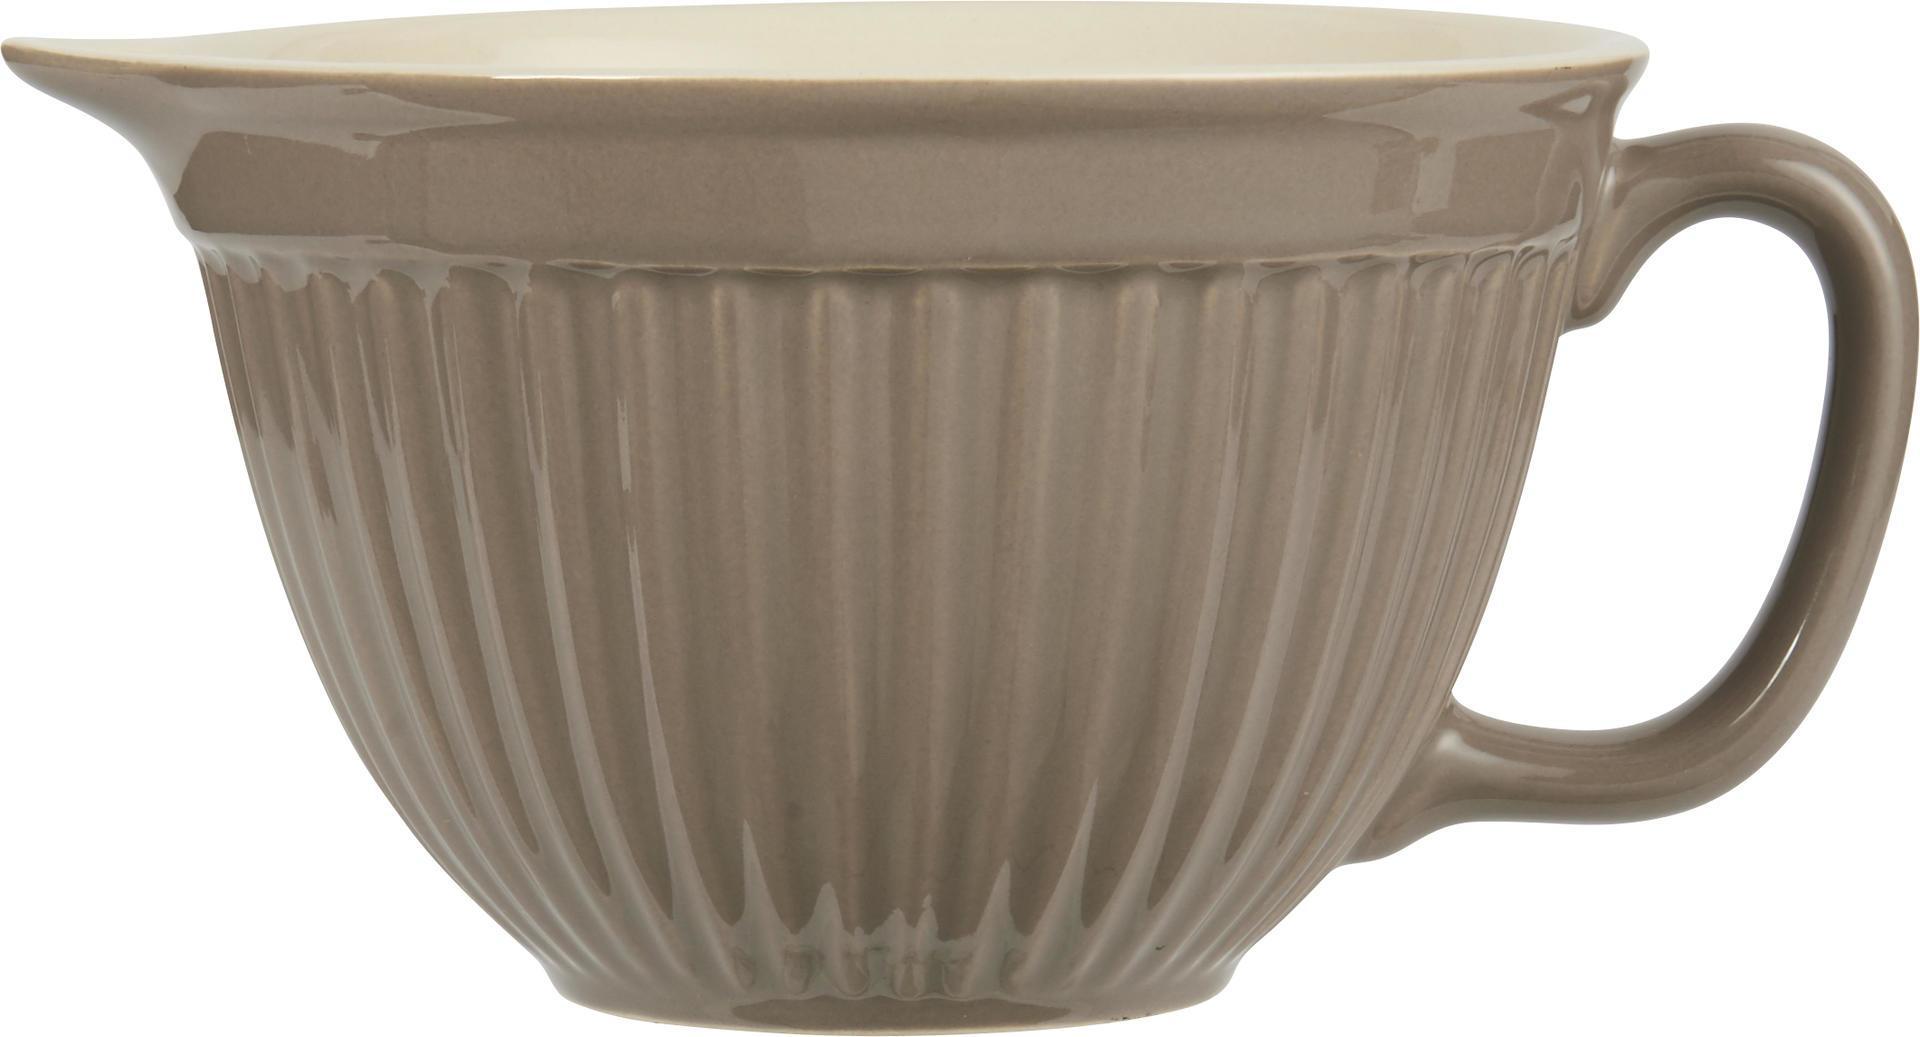 IB LAURSEN Mísa na těsto Mynte Milky brown, hnědá barva, keramika